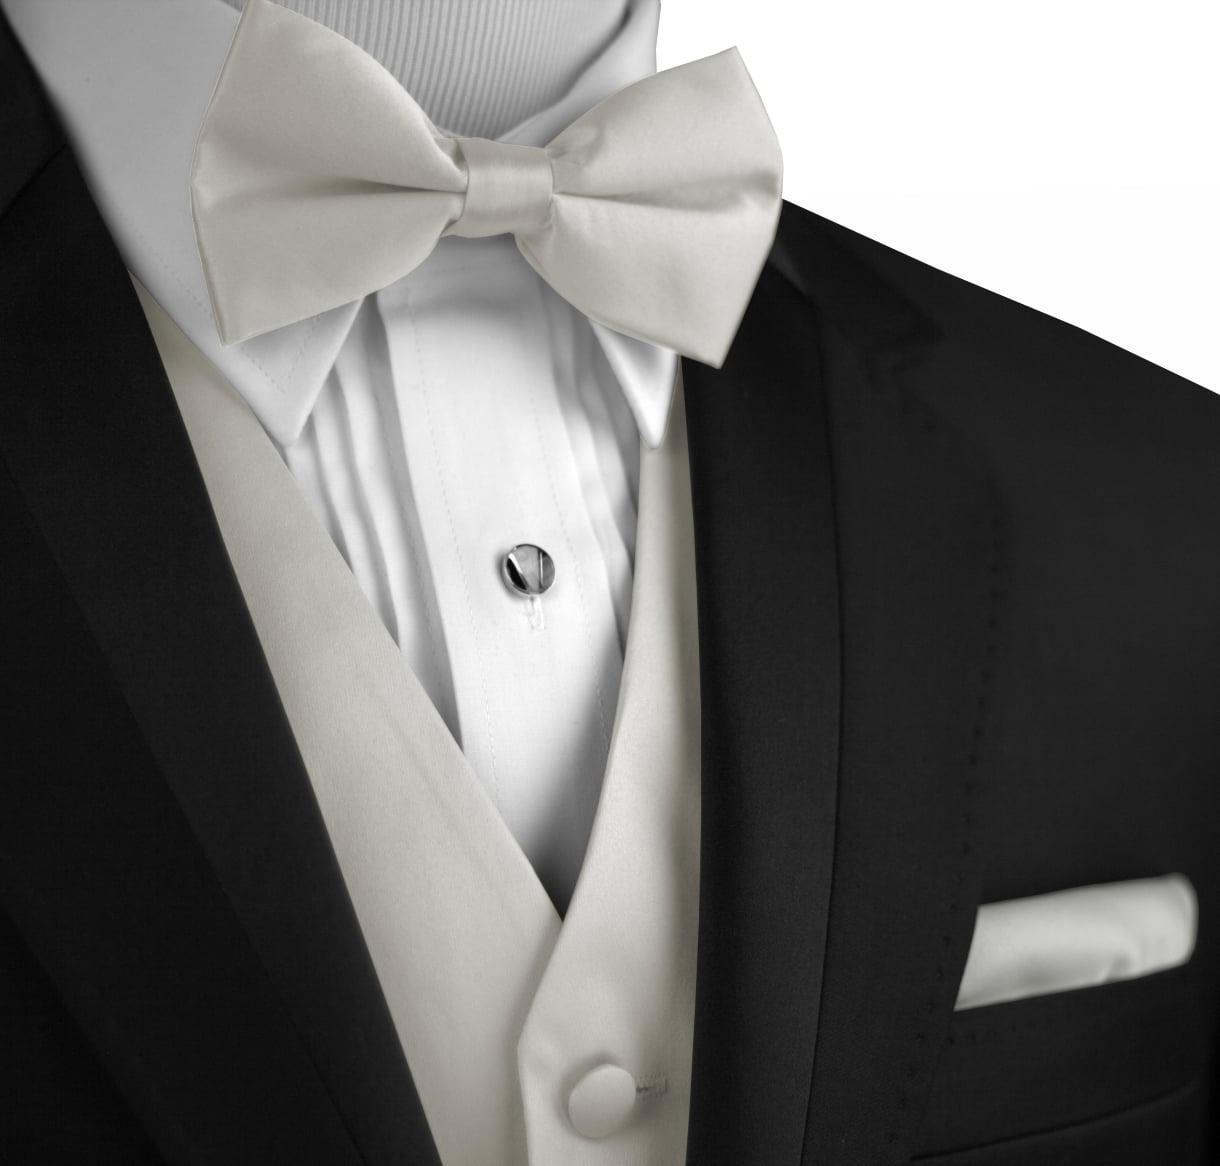 Tie /& Pocket Square Set in Gold Brand Q Mens Formal Prom Wedding Tuxedo Vest